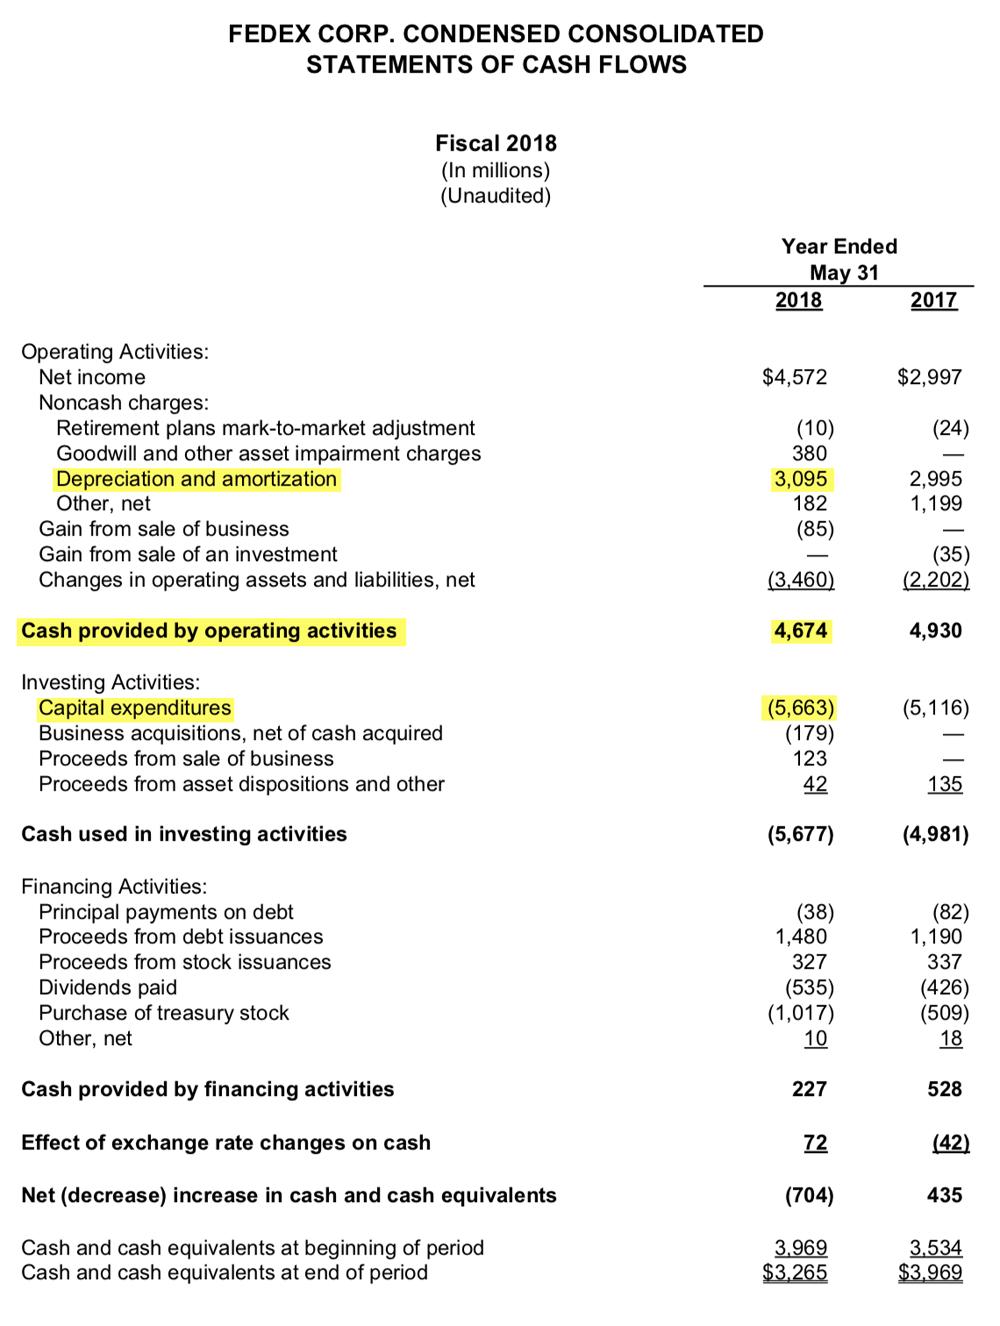 Cтраница 18 отчета FedEx за 2018 финансовый год